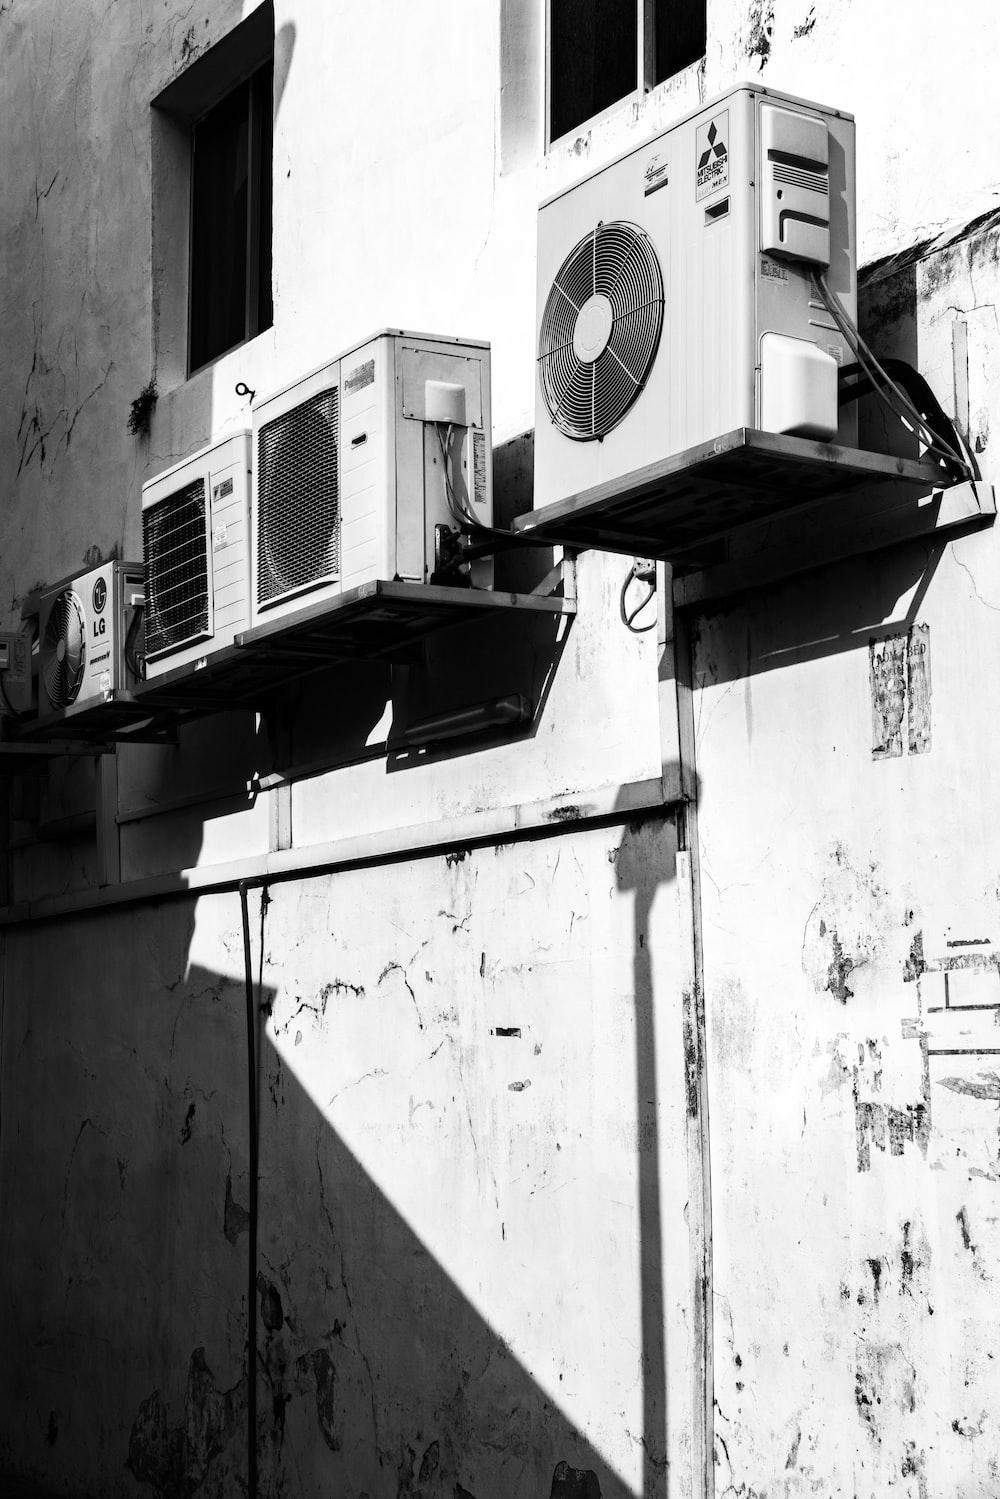 greyscale photography of AC units